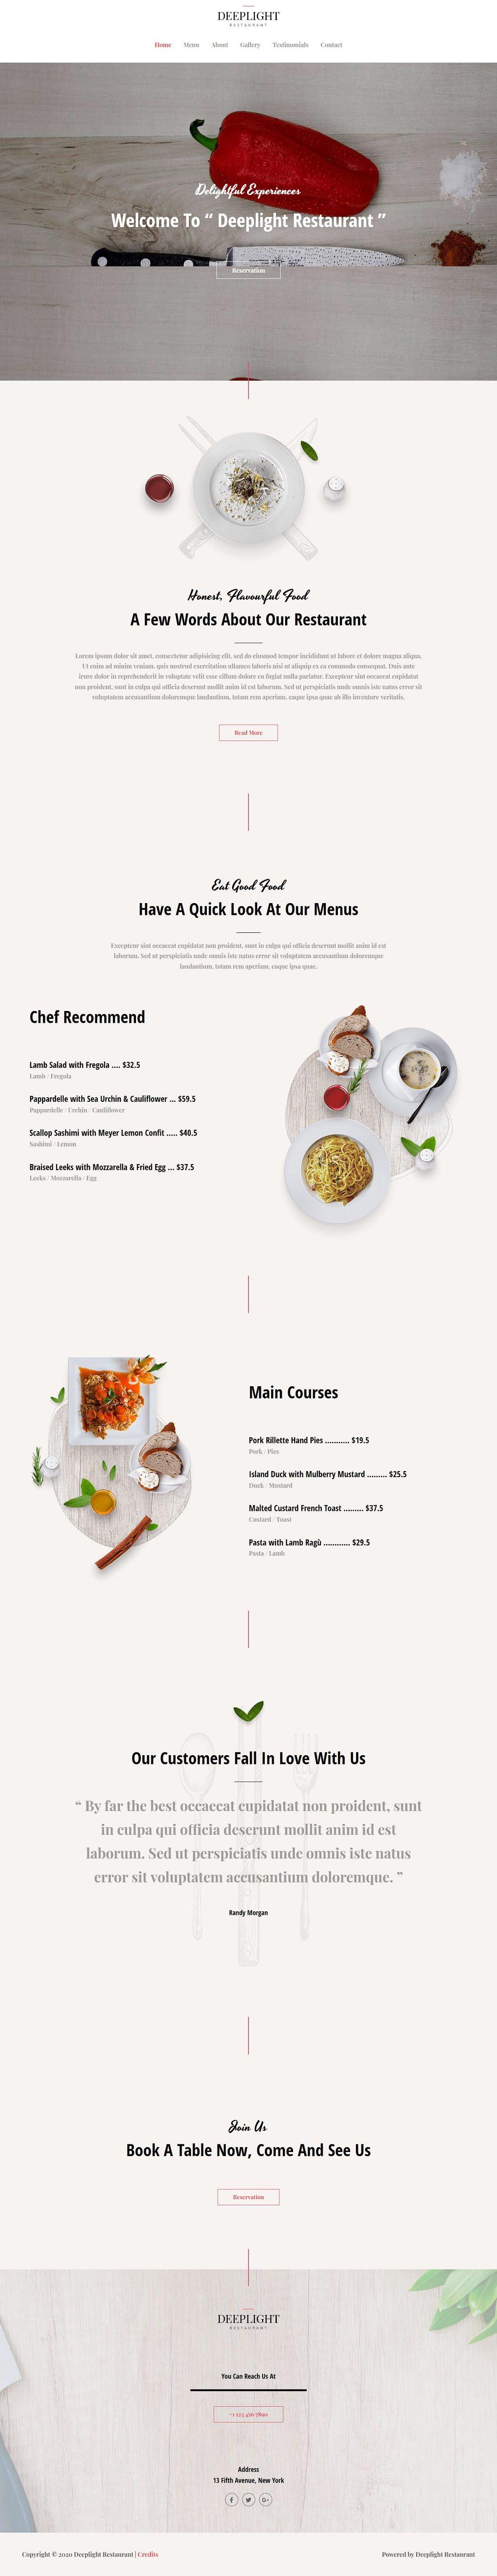 Restaurant - Deeplight - Home Page 1280 x 5705